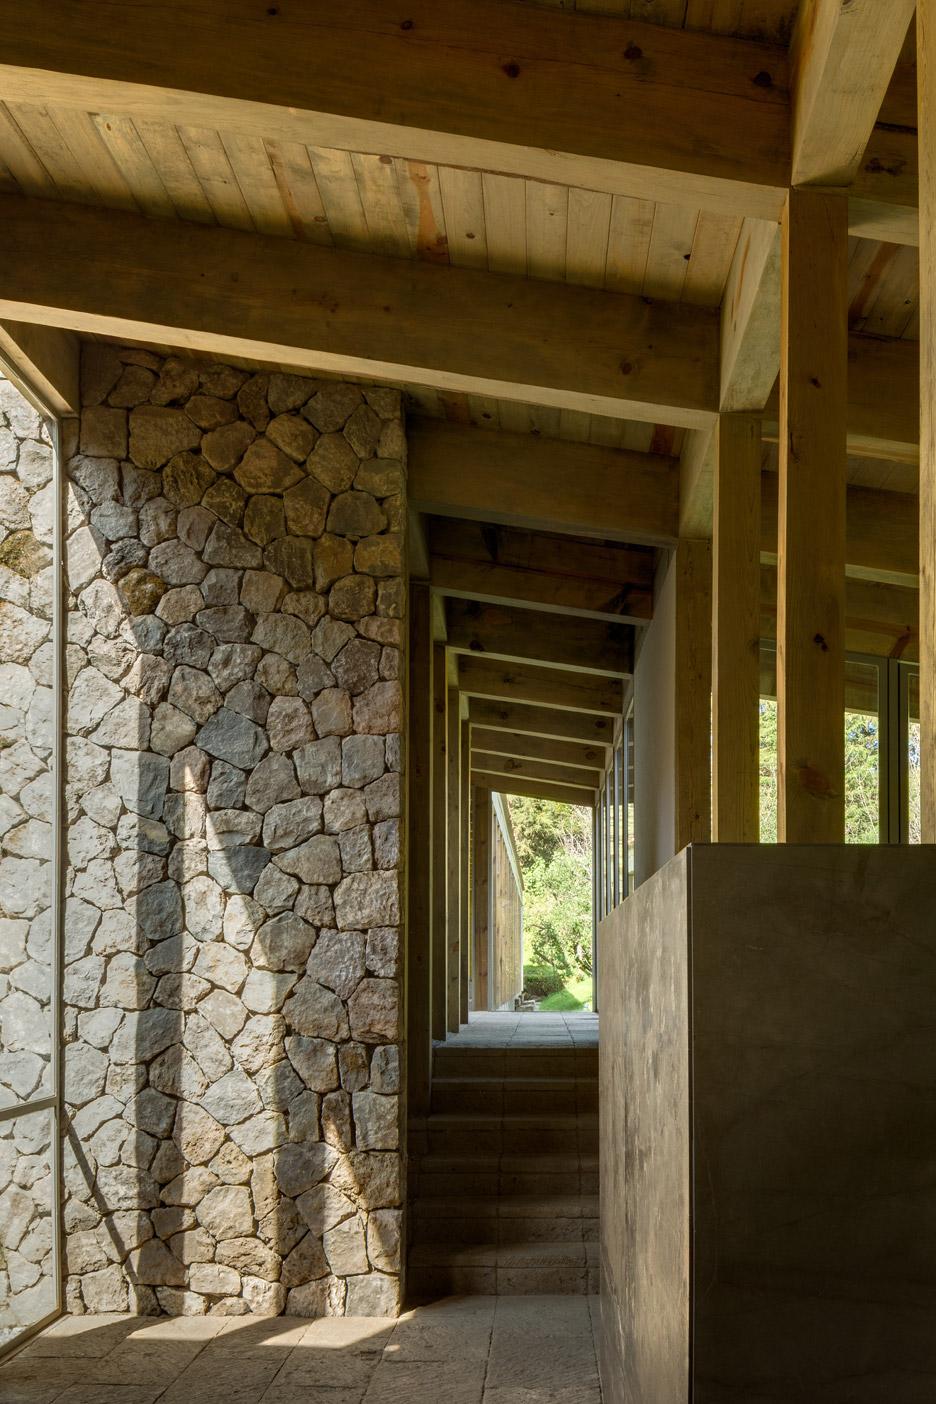 santana-house-cc-arquitectos-valle-de-bravo-mexico-city-_dezeen_936_0.jpg